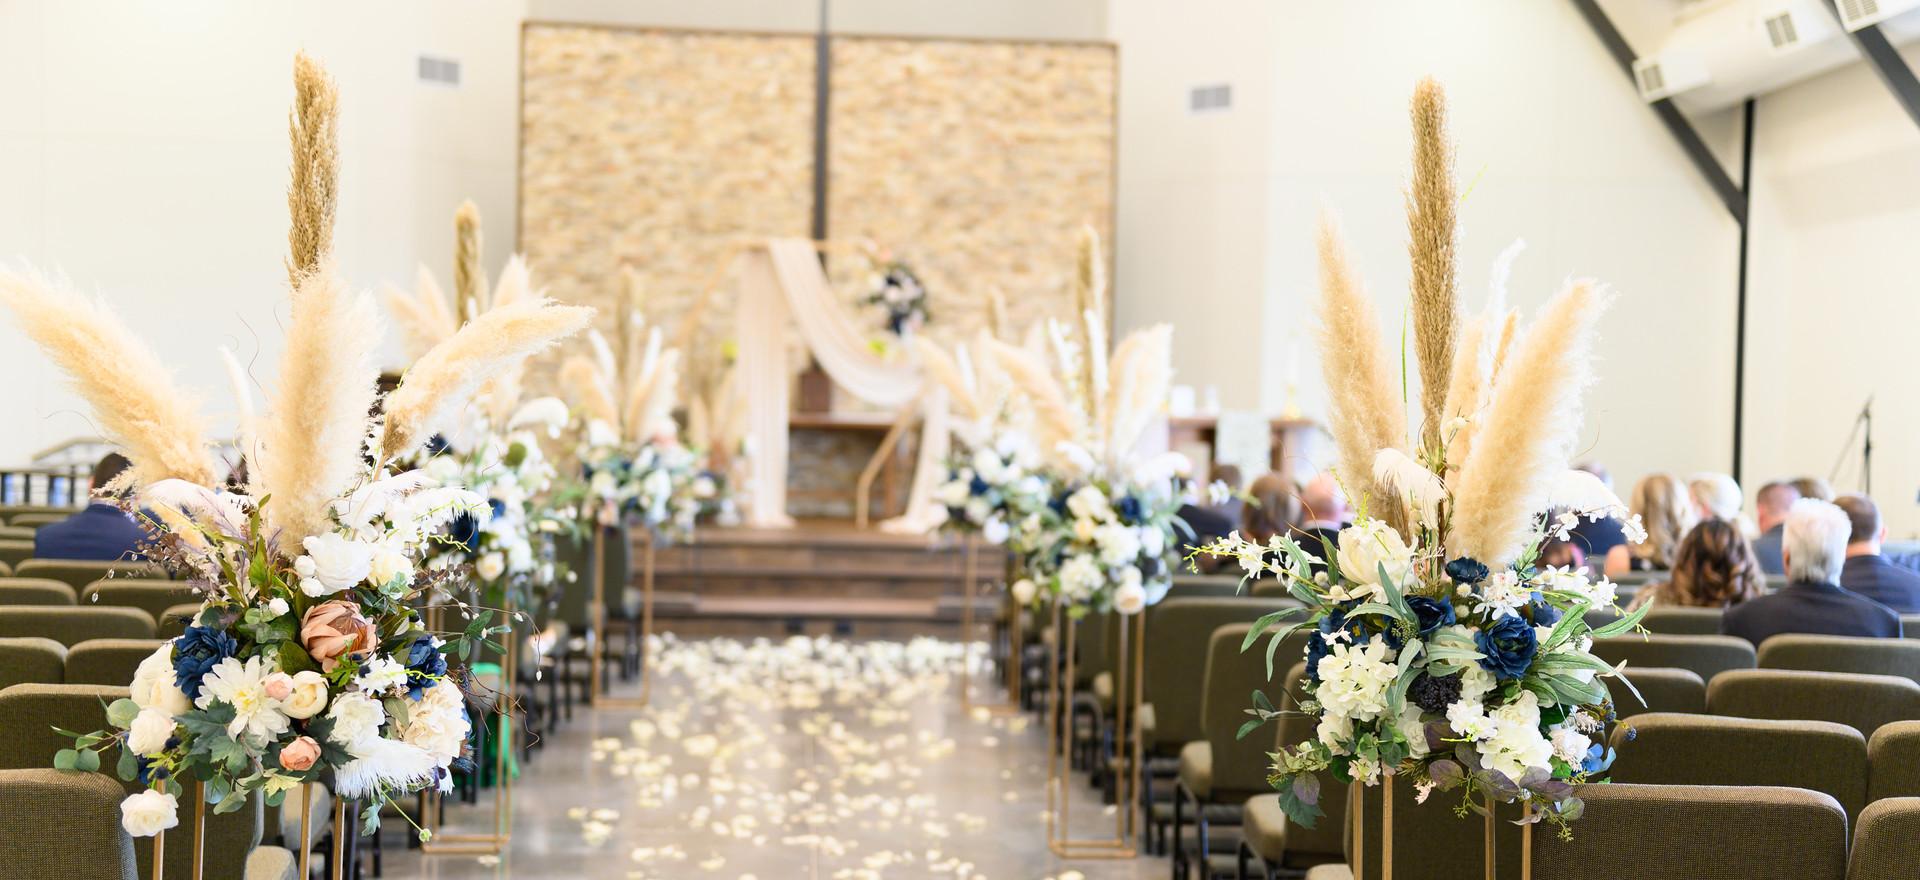 035_Lorena and Mike's Wedding day.jpg